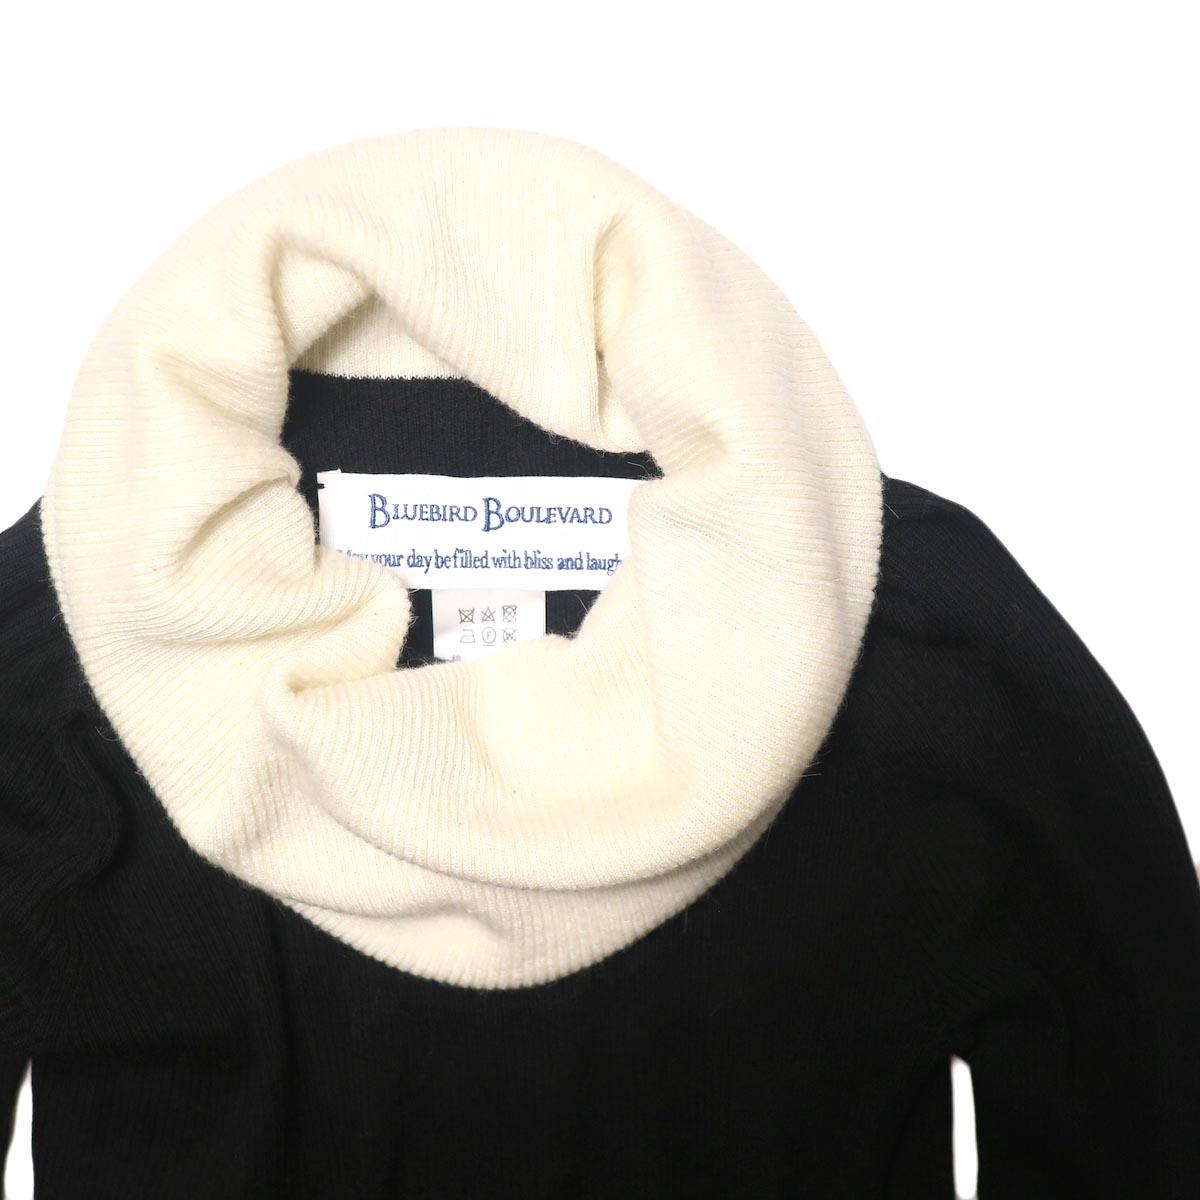 BLUEBIRD BOULEVARD Cotton & Angora Wide Turtleneck Sweater (black) ネック部分